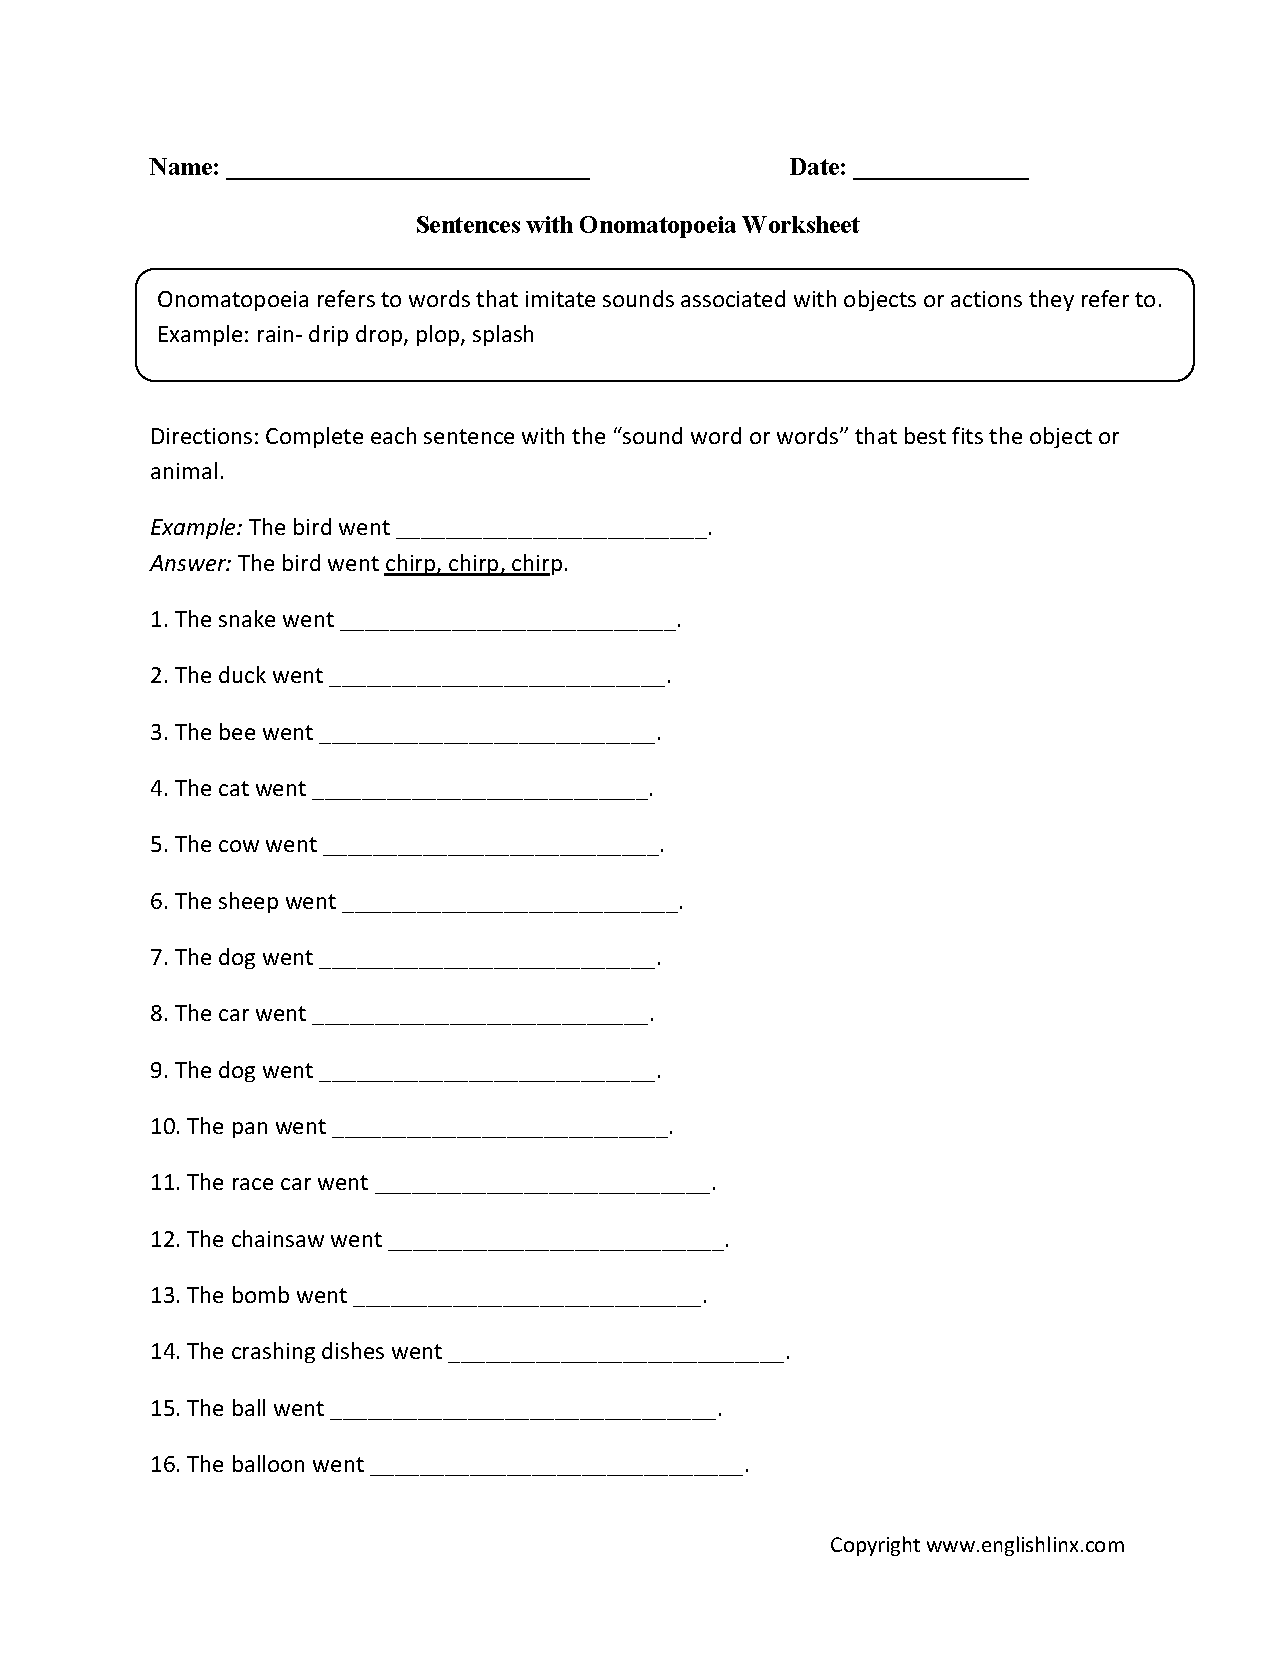 Sentences With Onomatopoeia Worksheet With Images